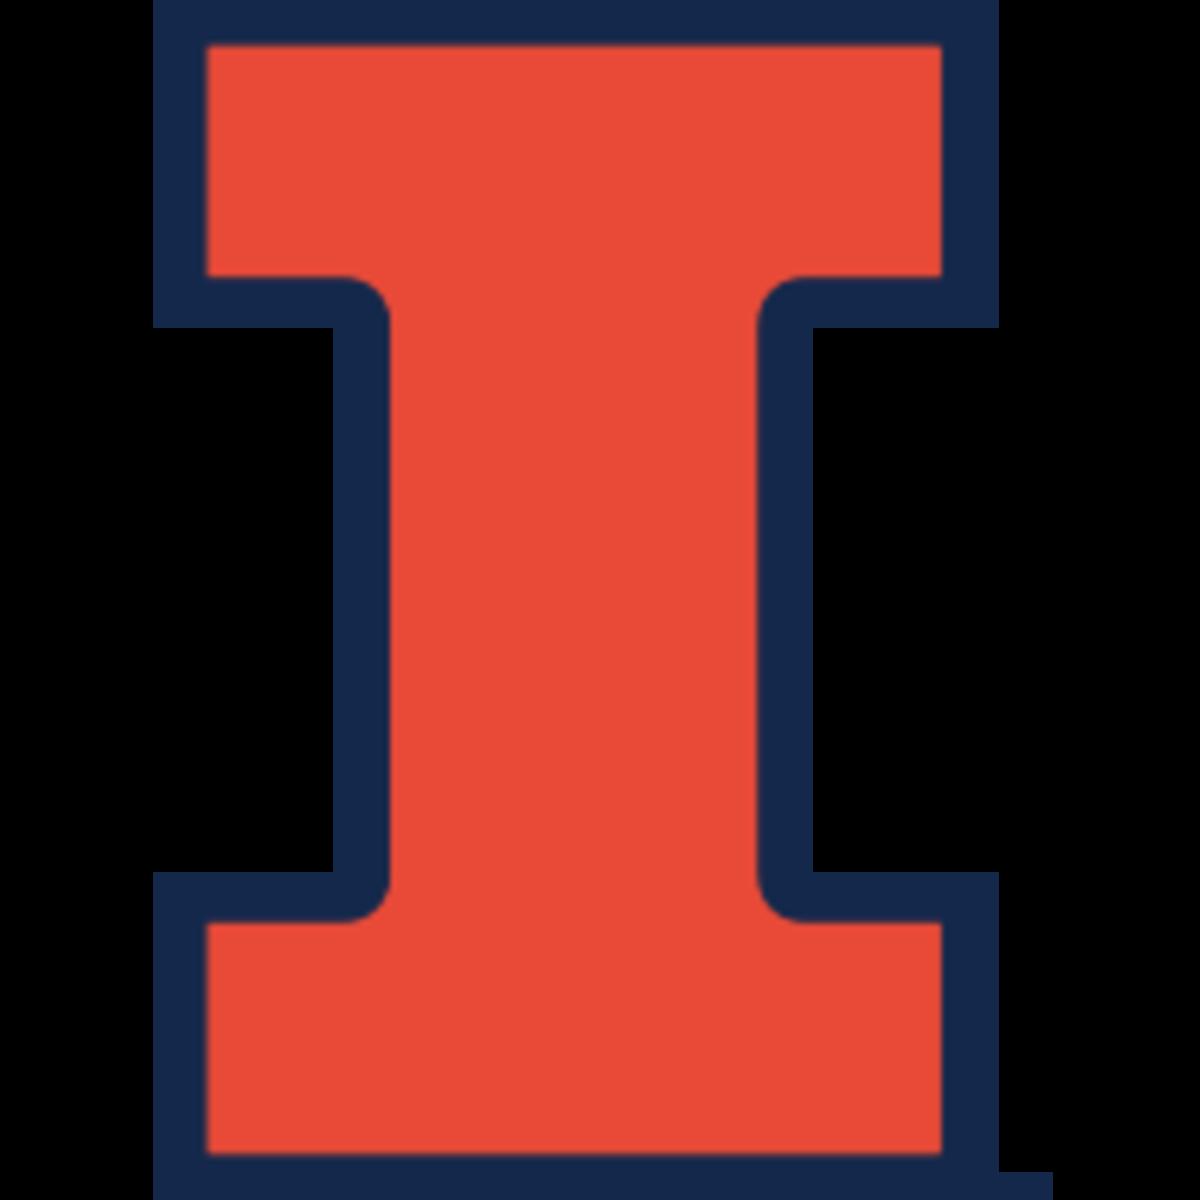 College Football Rankings: Illinois